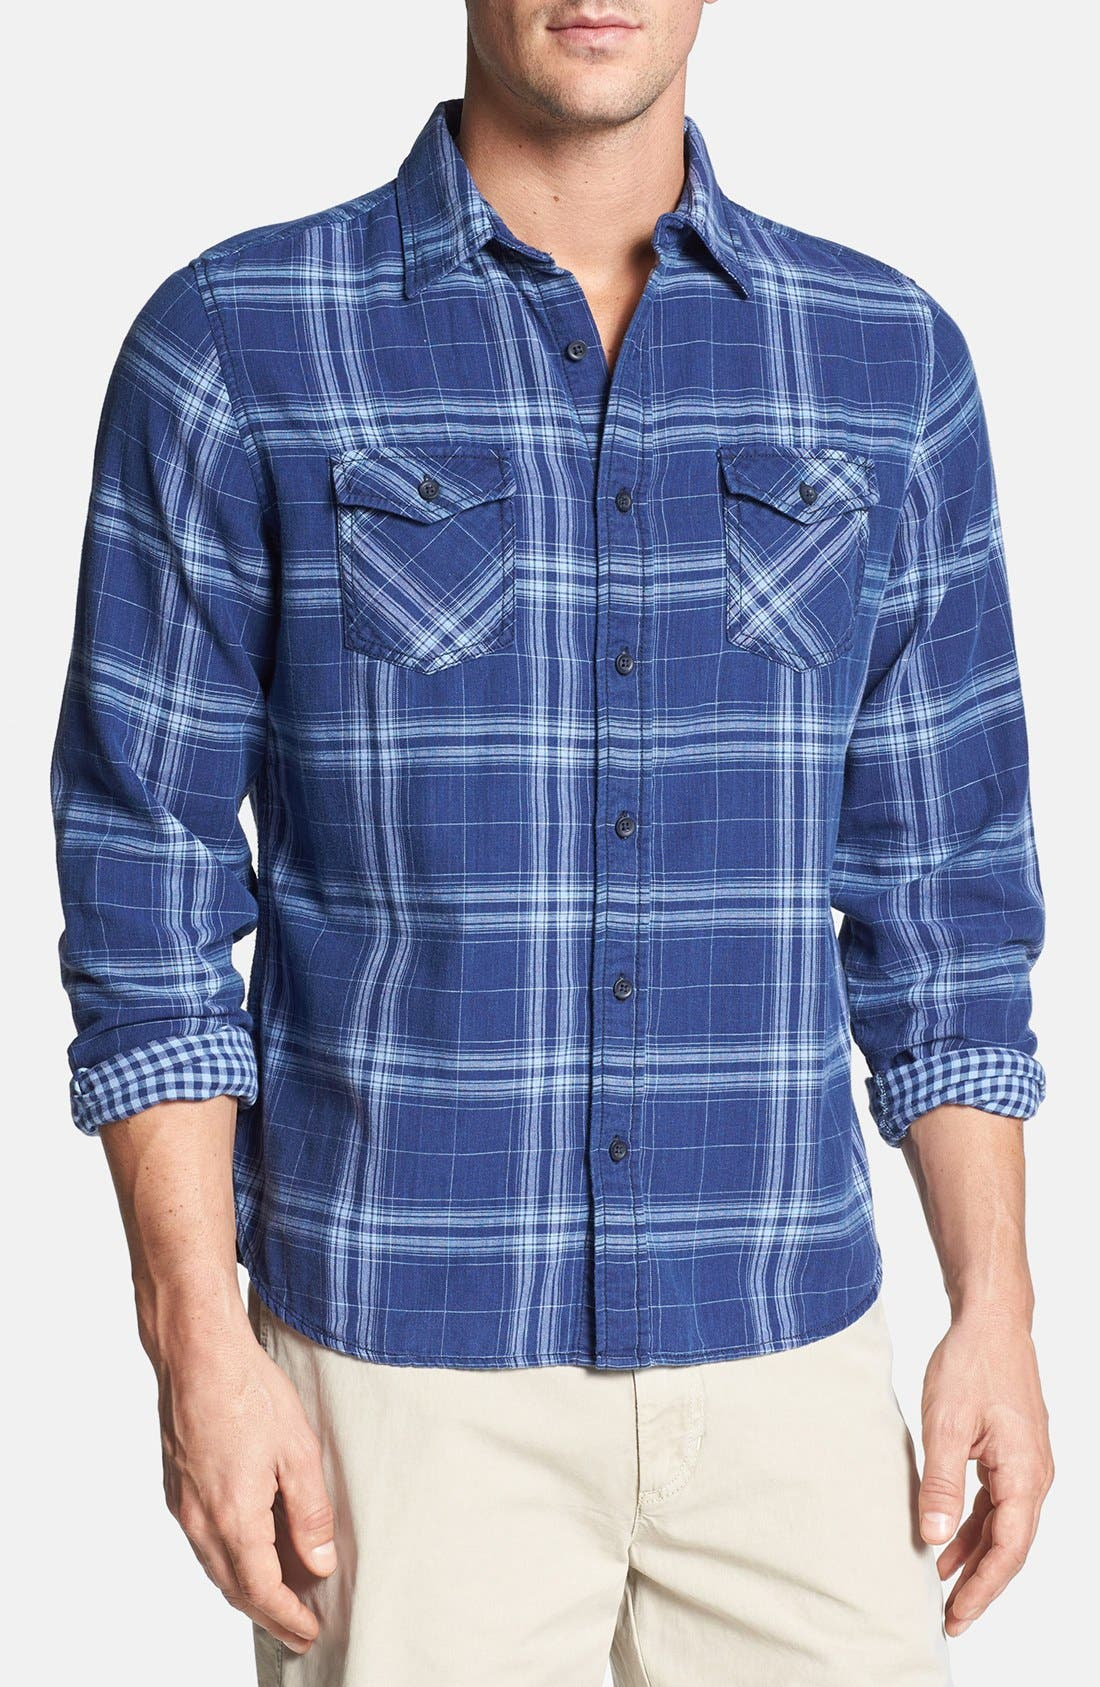 Main Image - Surfside Supply Double Face Plaid Cotton Shirt